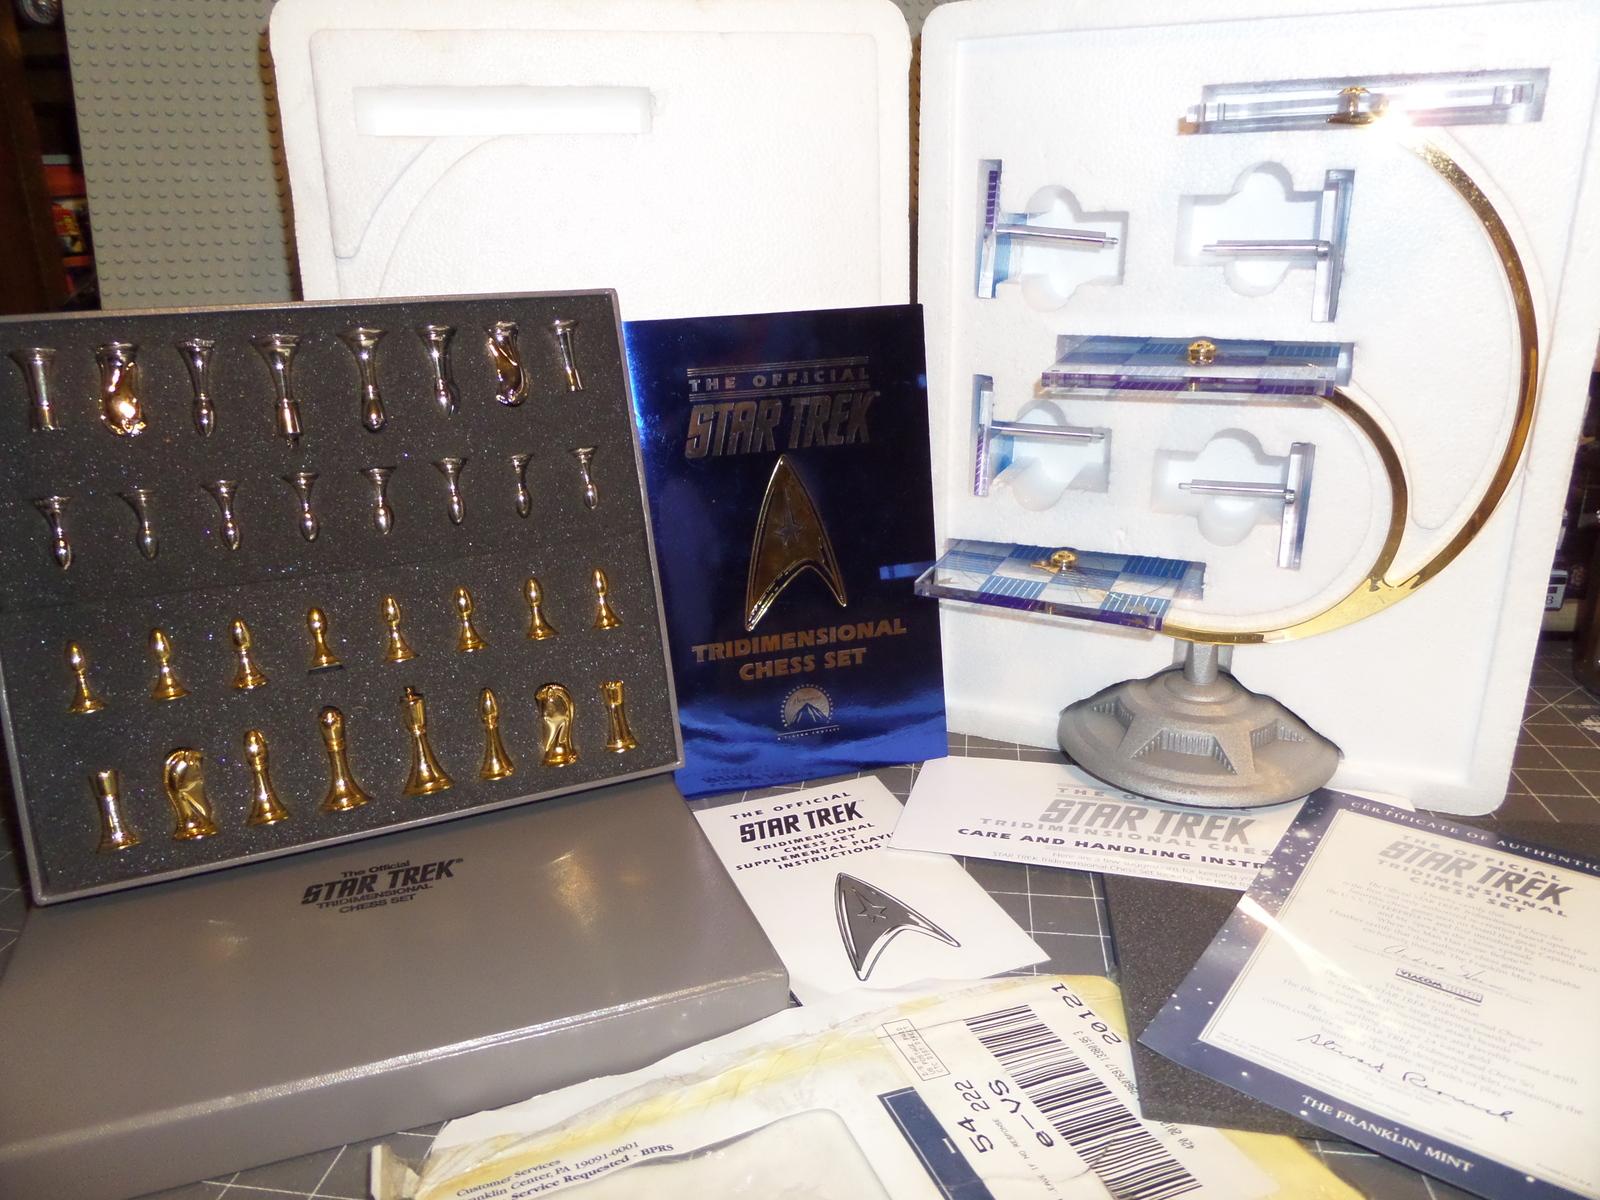 Star Trek 3d Tridimensional 1994 Chess Set Franklin Mint Complete In Original Pa Original Series